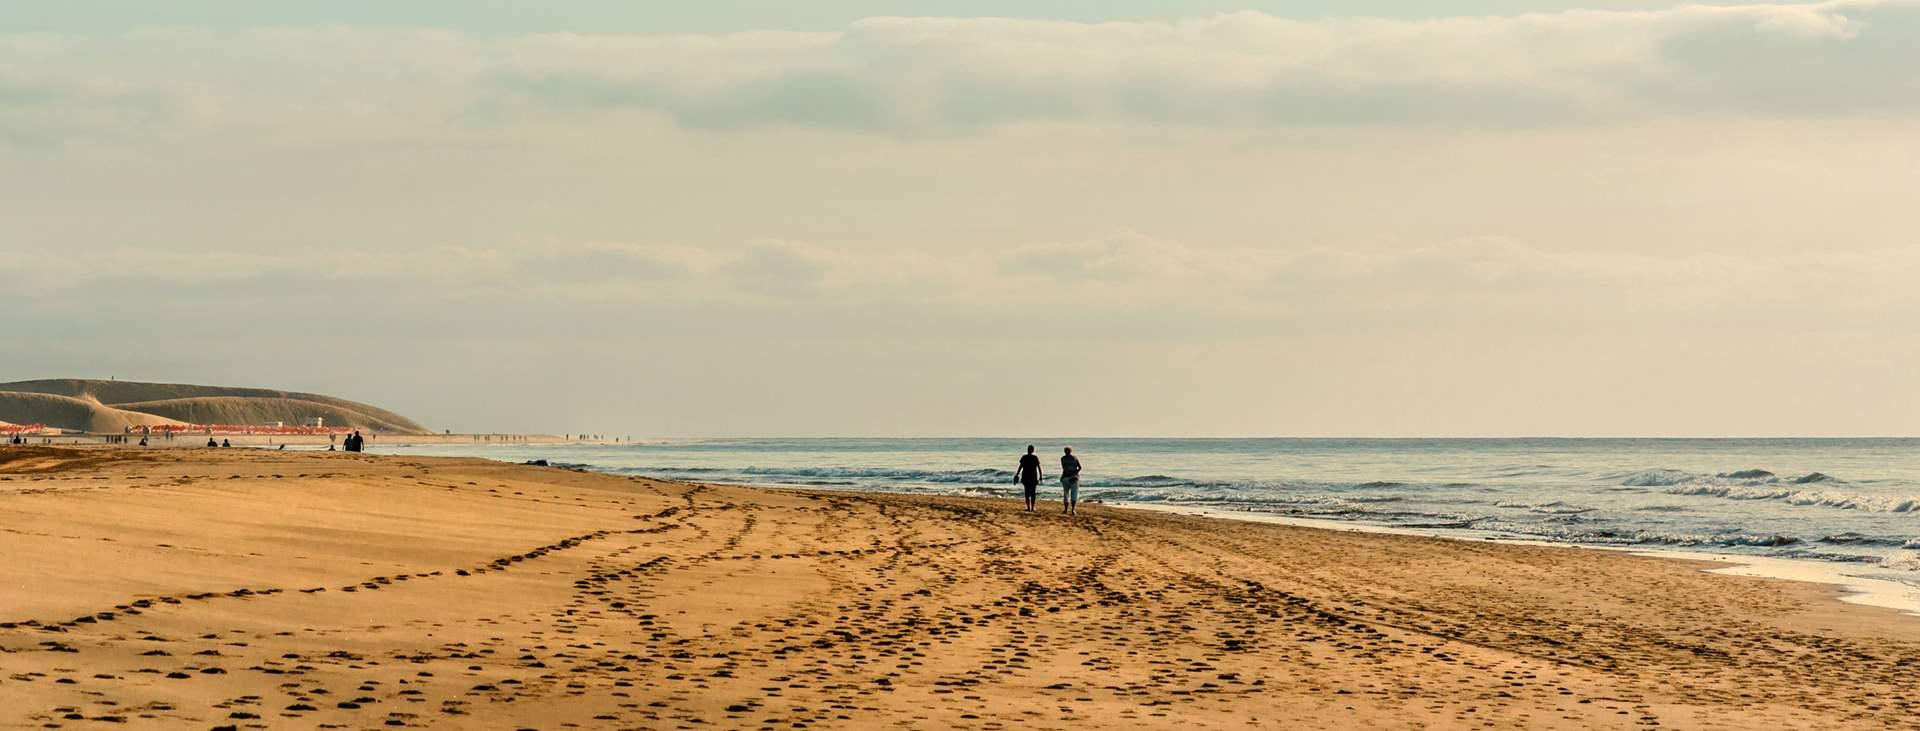 Bestill en reise til Playa del Inglés på Gran Canaria med Ving